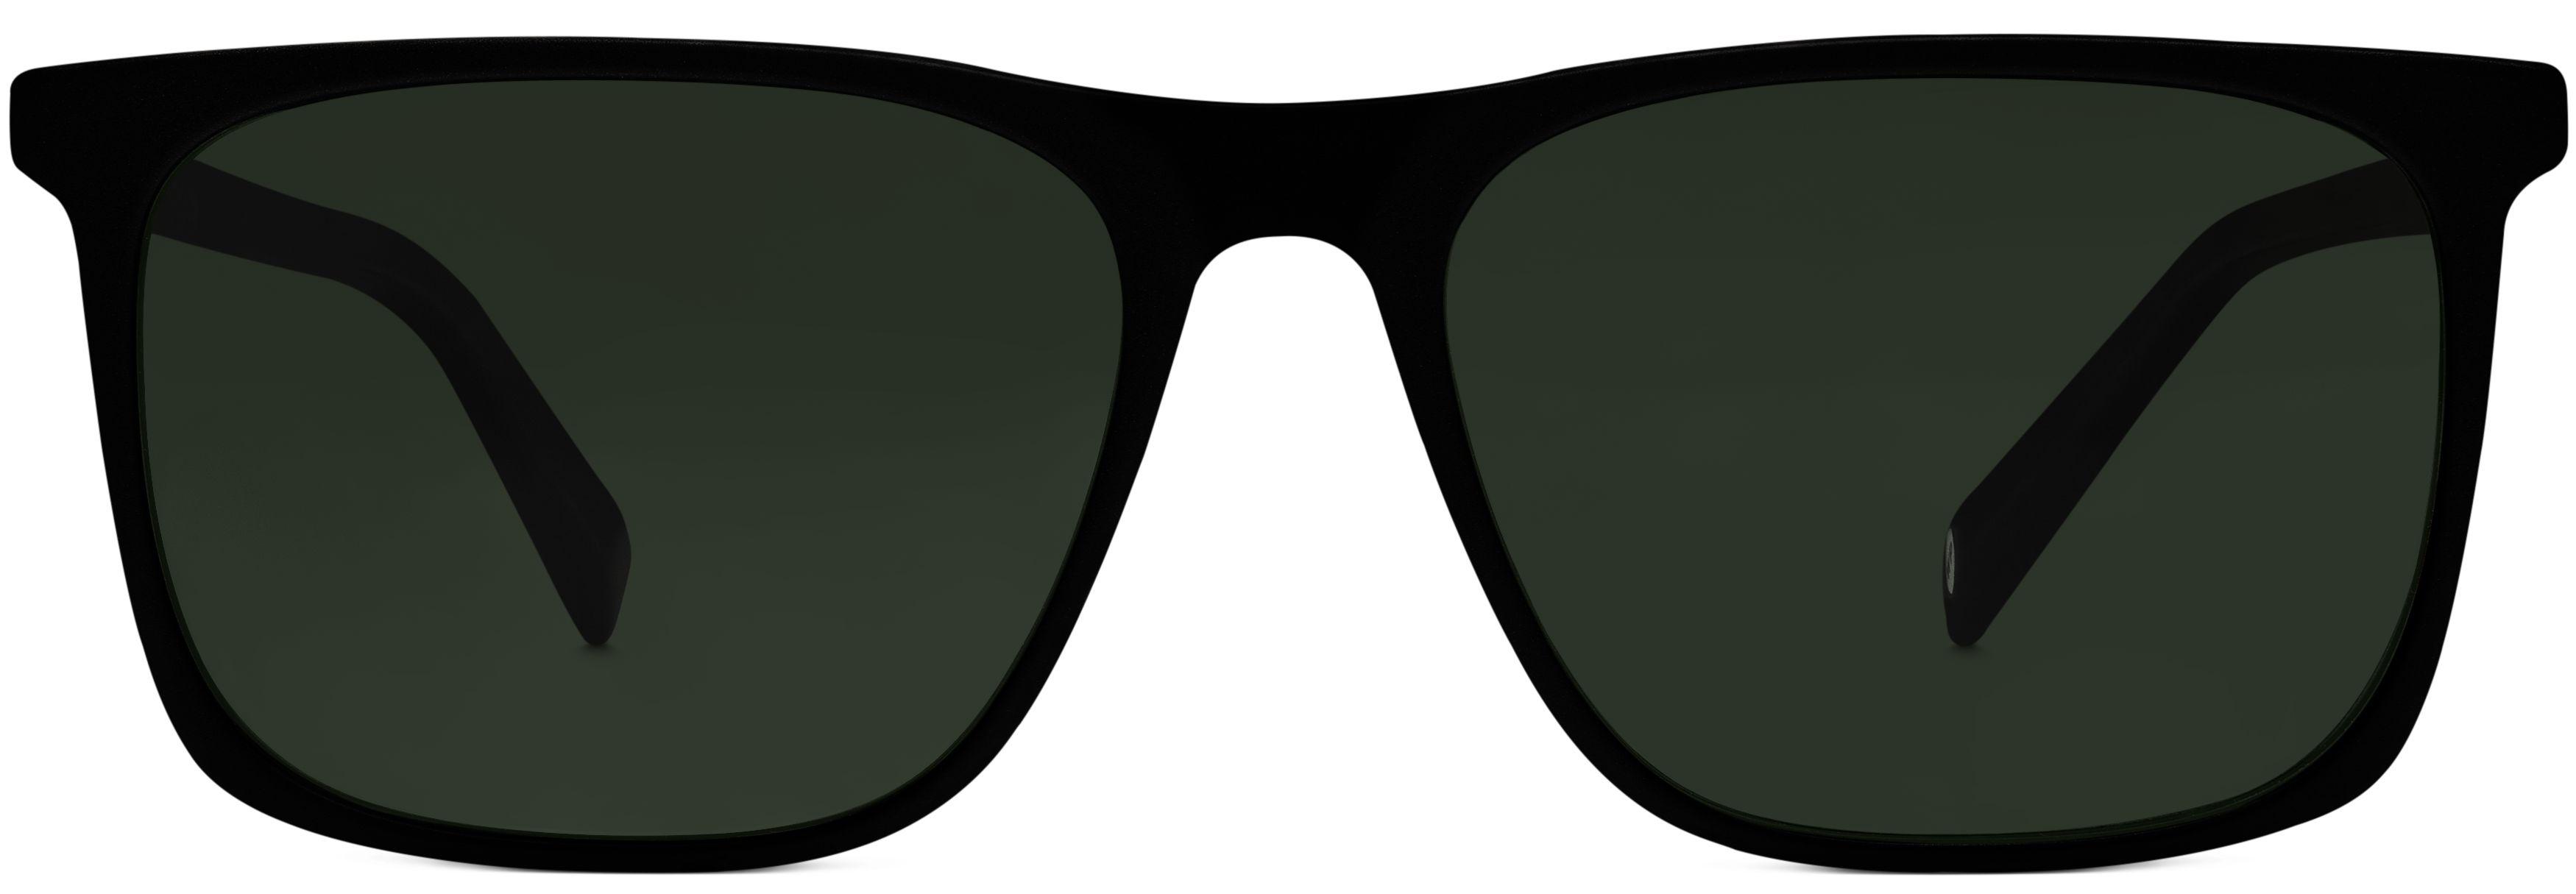 c9aedabea8 Fletcher Sunglasses in Black Matte Eclipse with Olive Green lenses for Men